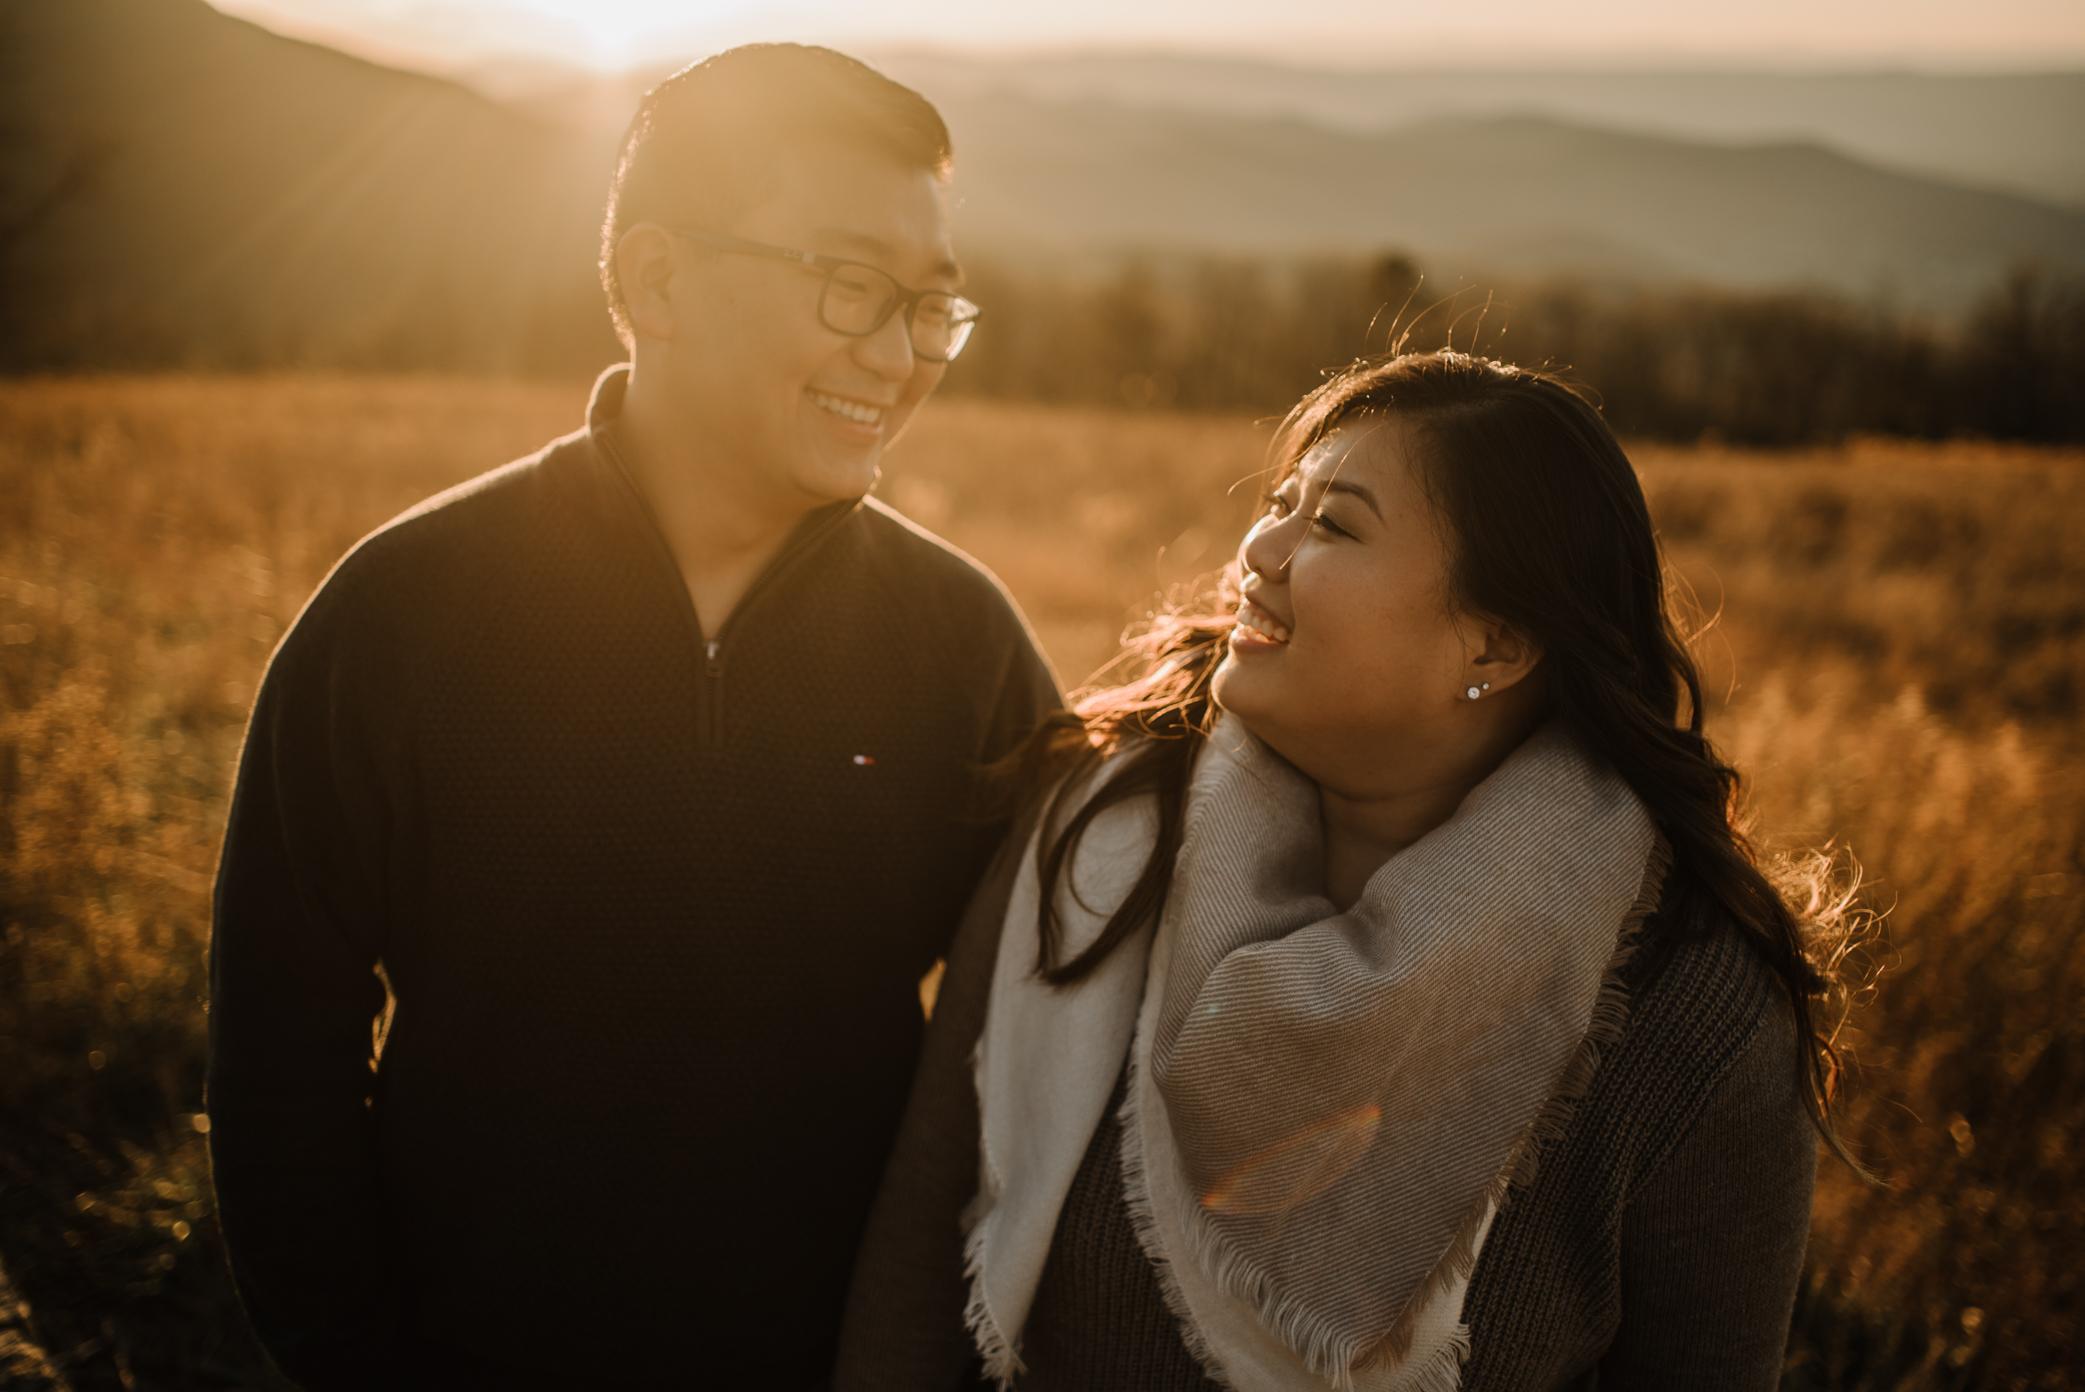 Joshua and Kristina - Shenandoah National Park - Skyline Drive - Winter Engagement Session Photographer - White Sails Creative_33.JPG